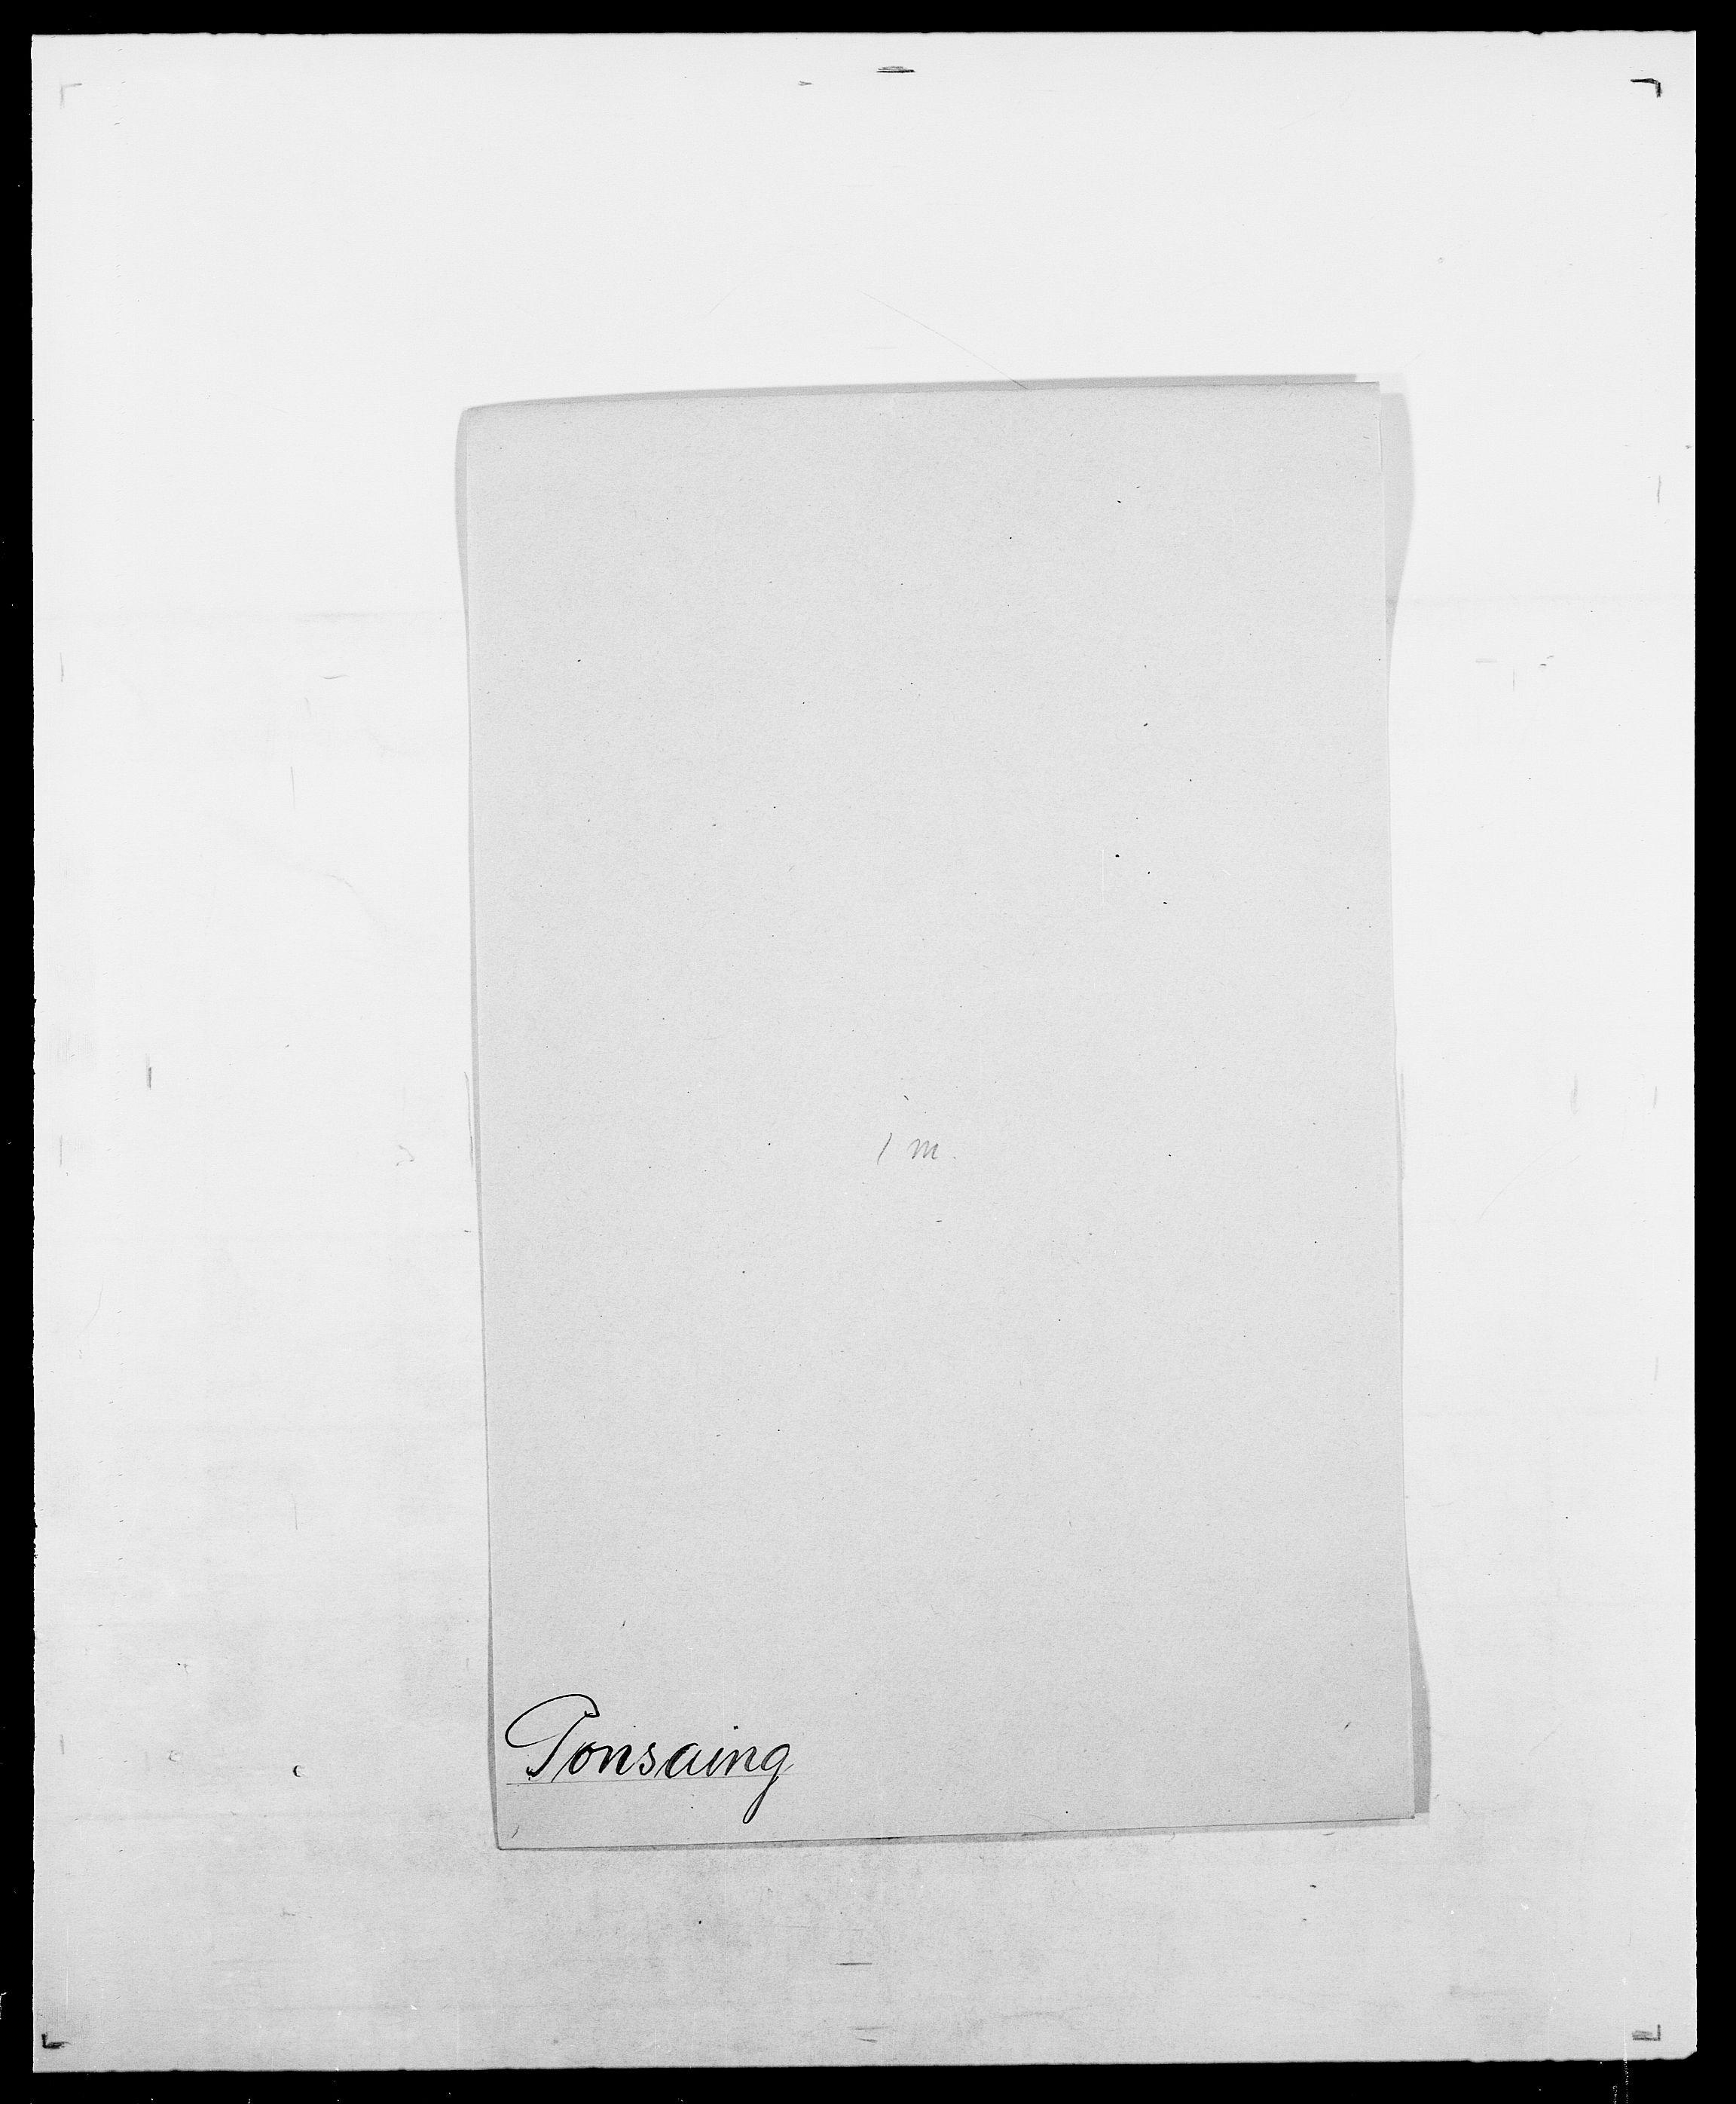 SAO, Delgobe, Charles Antoine - samling, D/Da/L0031: de Place - Raaum, s. 204